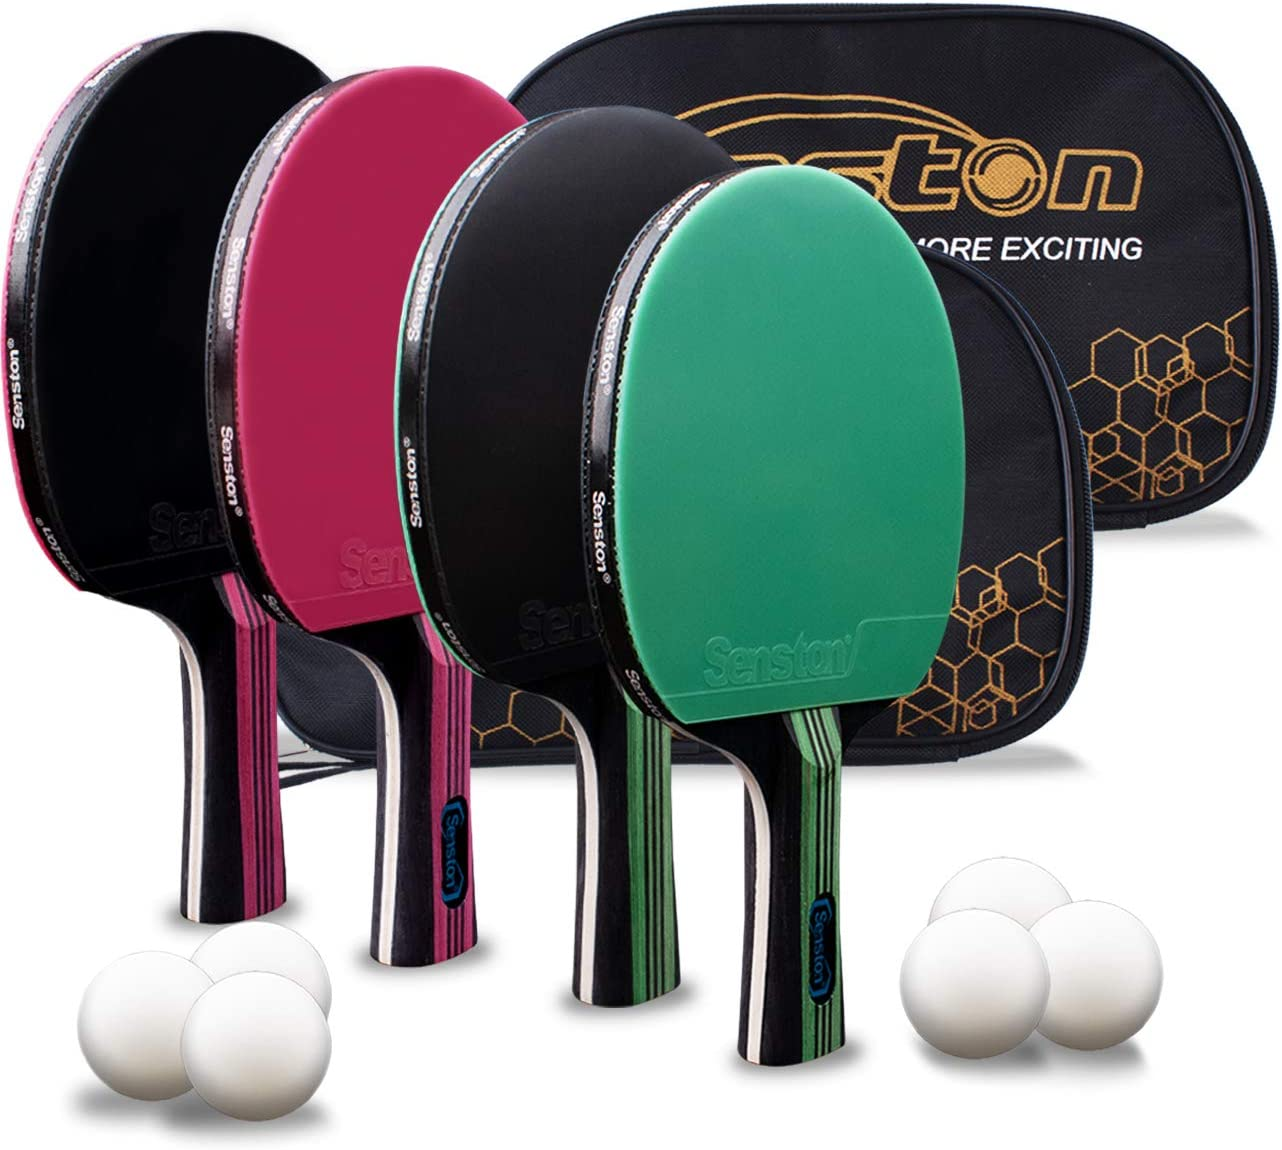 Senston 4 Table Tennis Bats and 6 Balls Professional Ping Pong Racket Set wi...